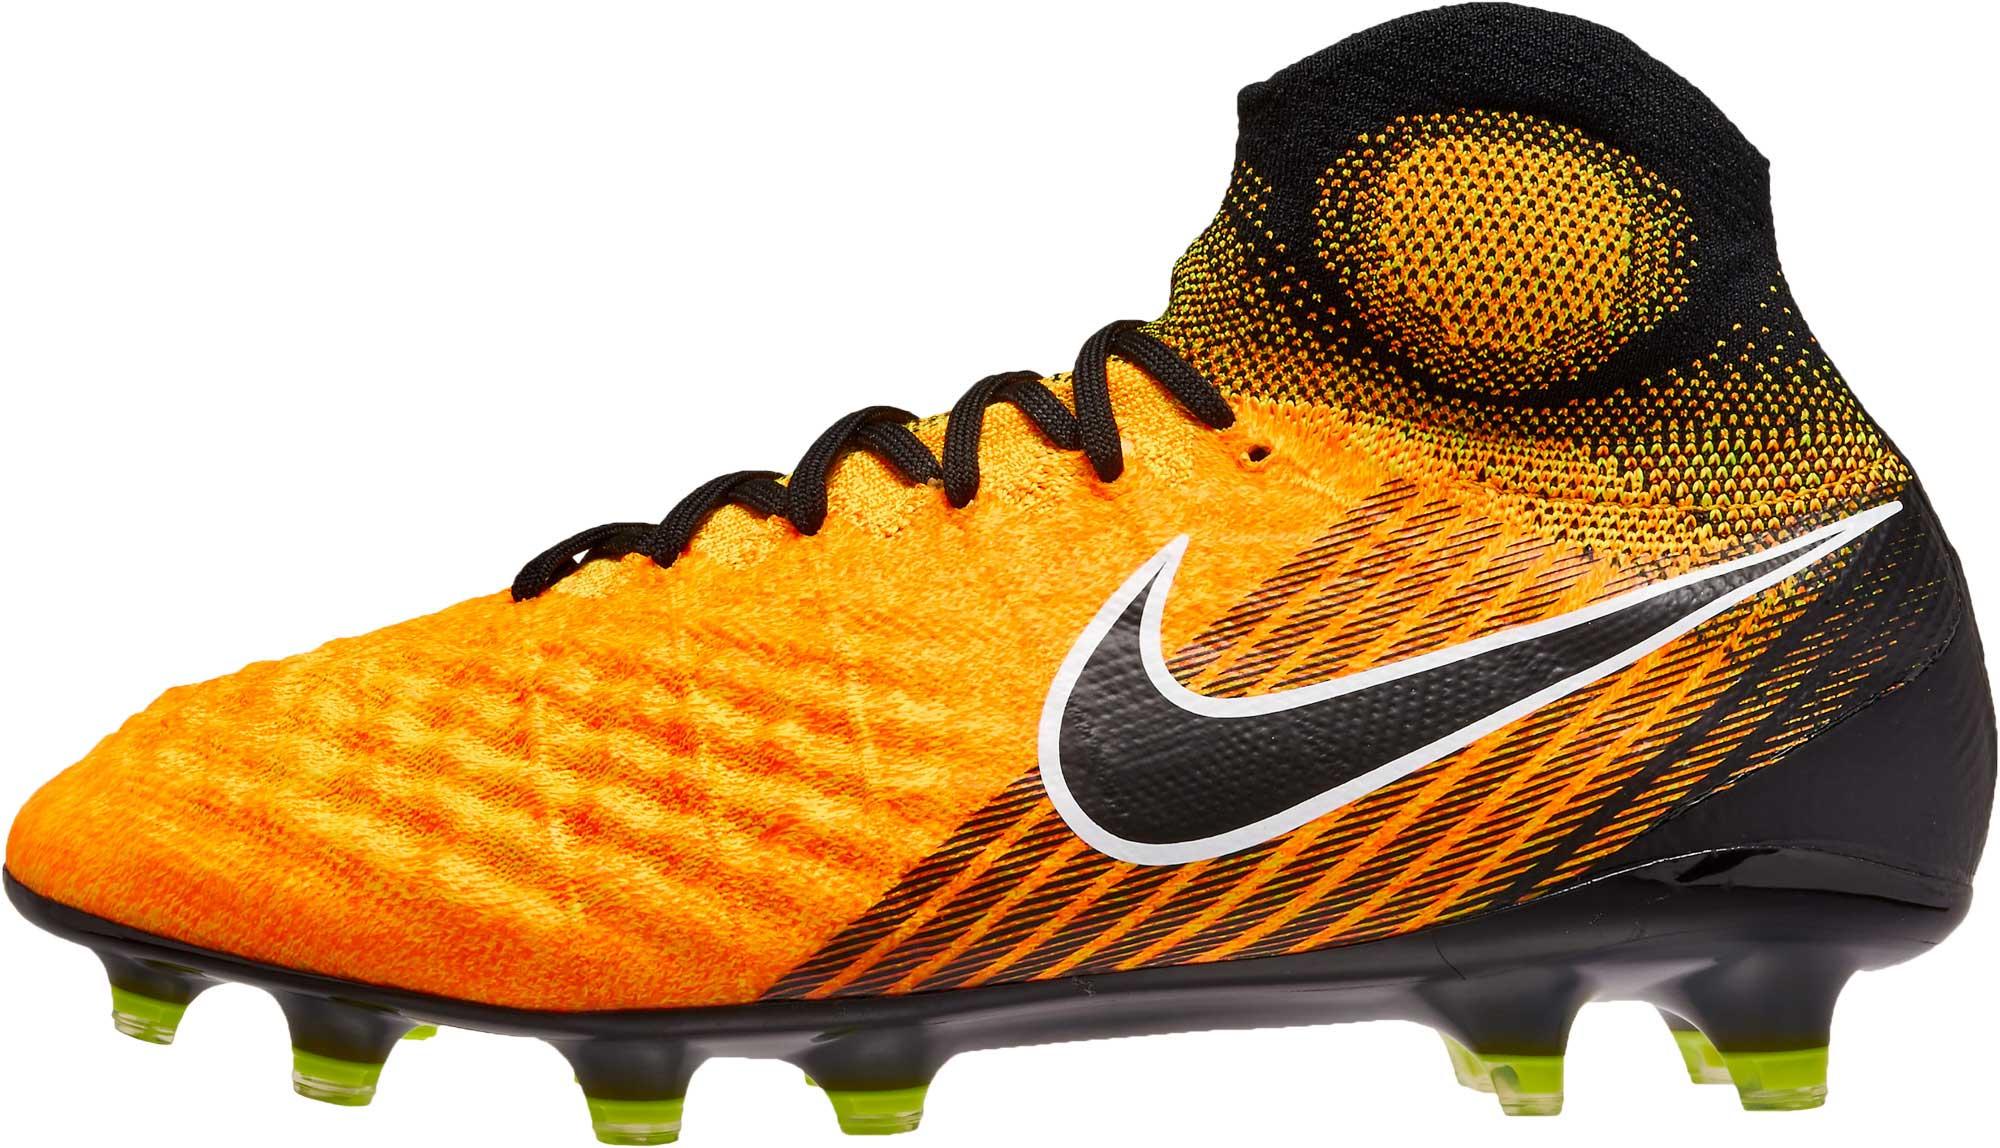 Palabra Palmadita Aburrido  Nike Magista Obra II Soccer Cleats - Orange Obra Cleats